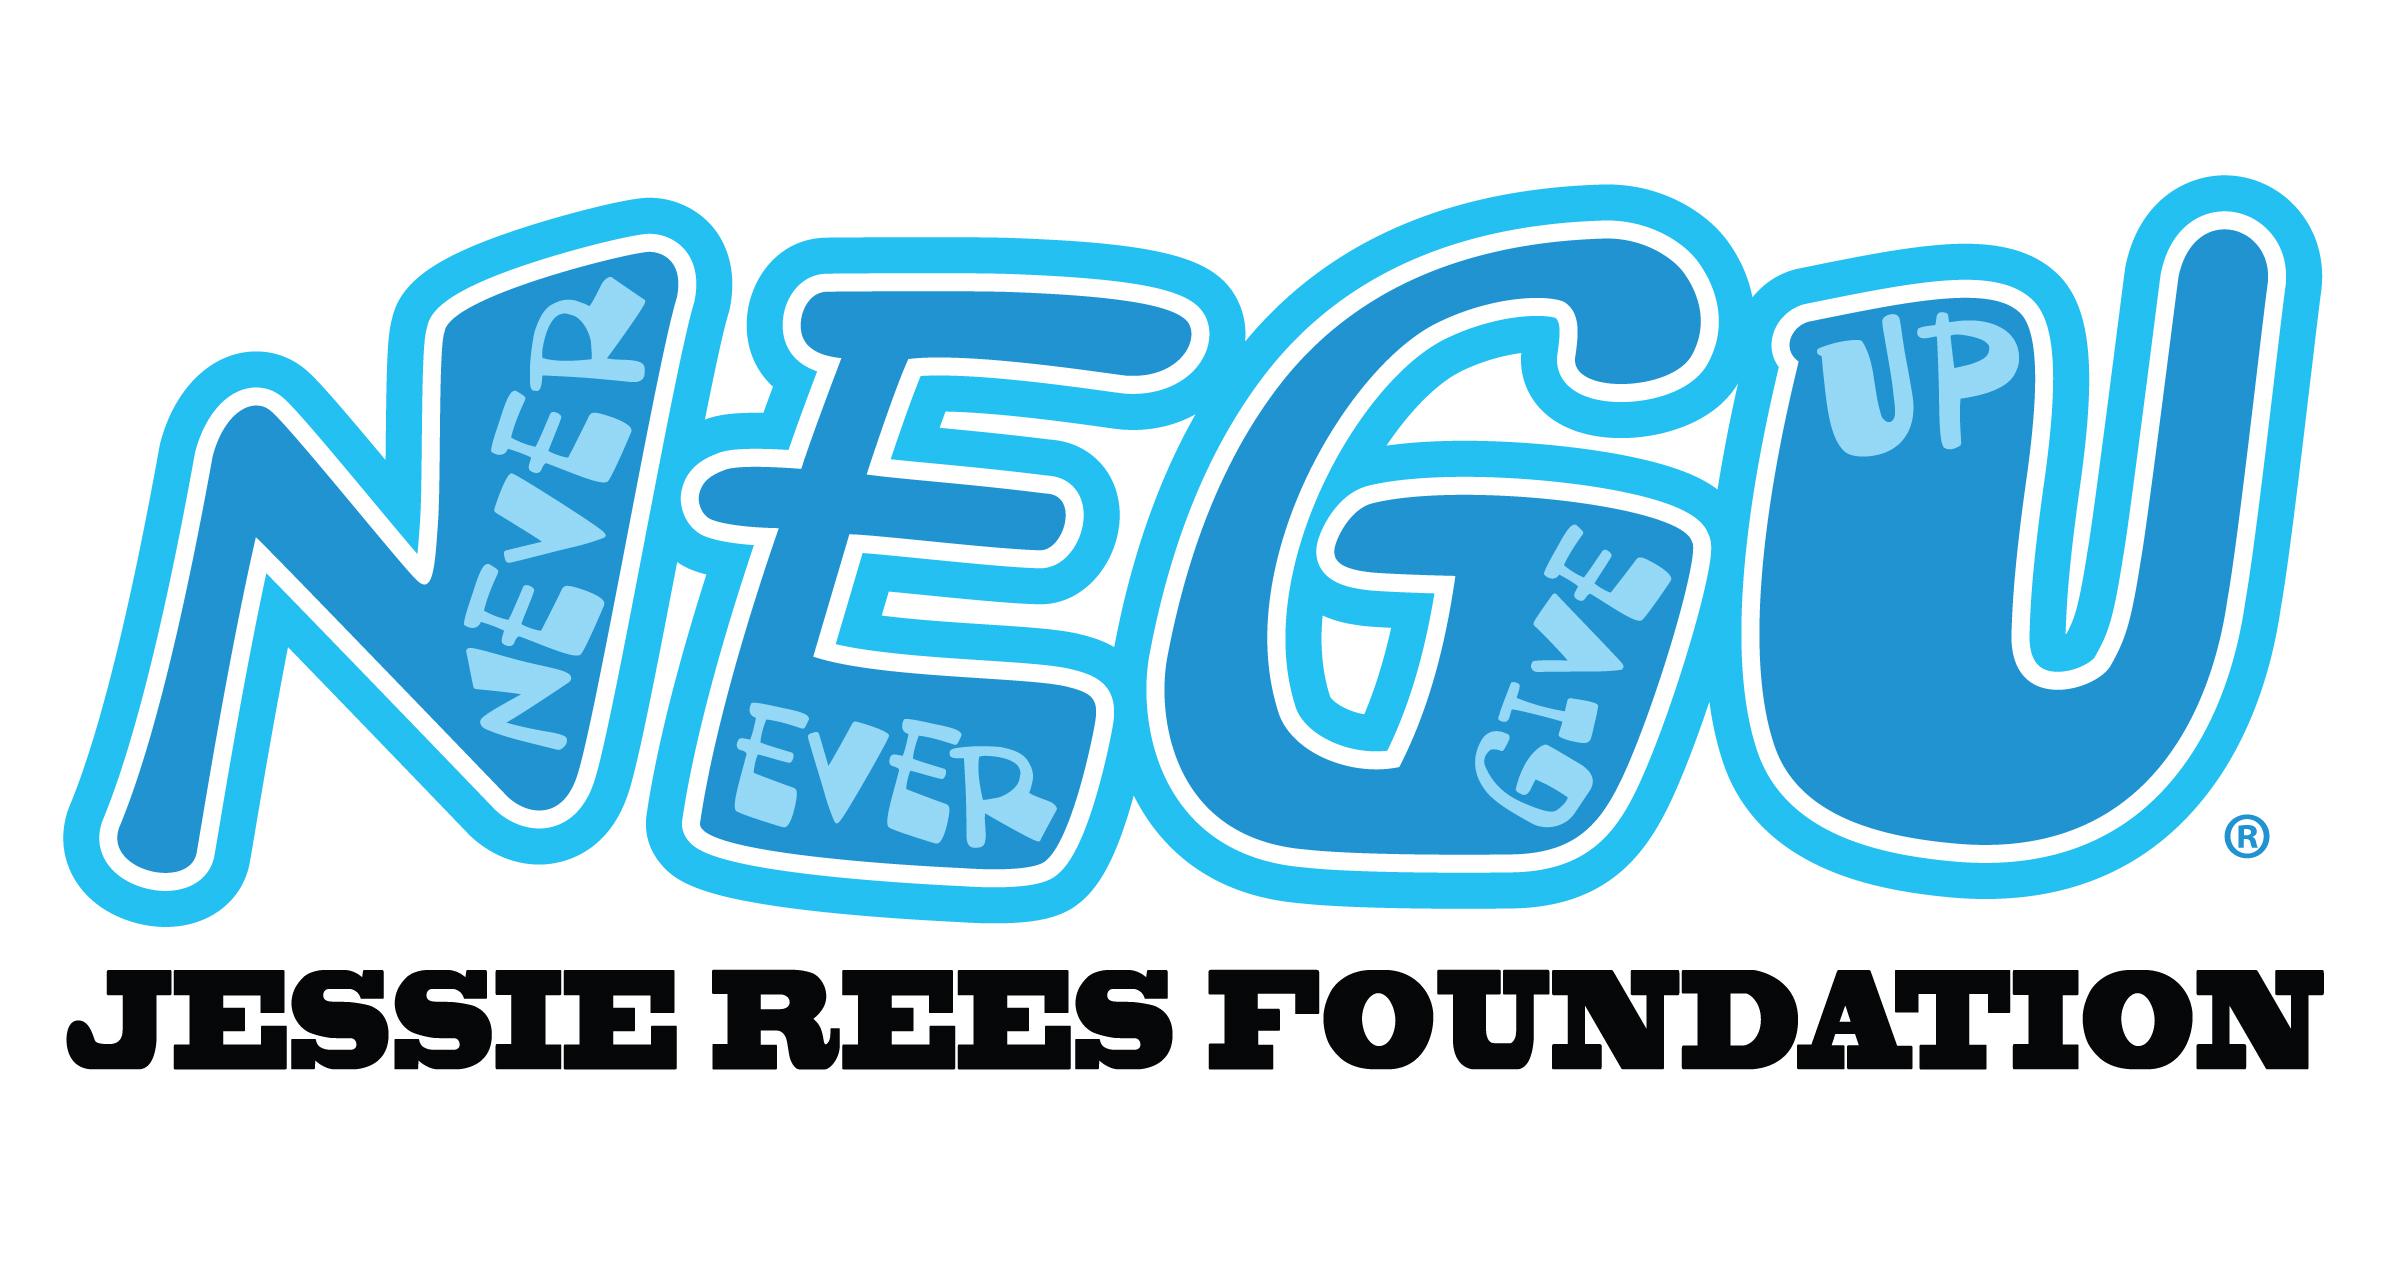 Jessie Rees Foundation logo